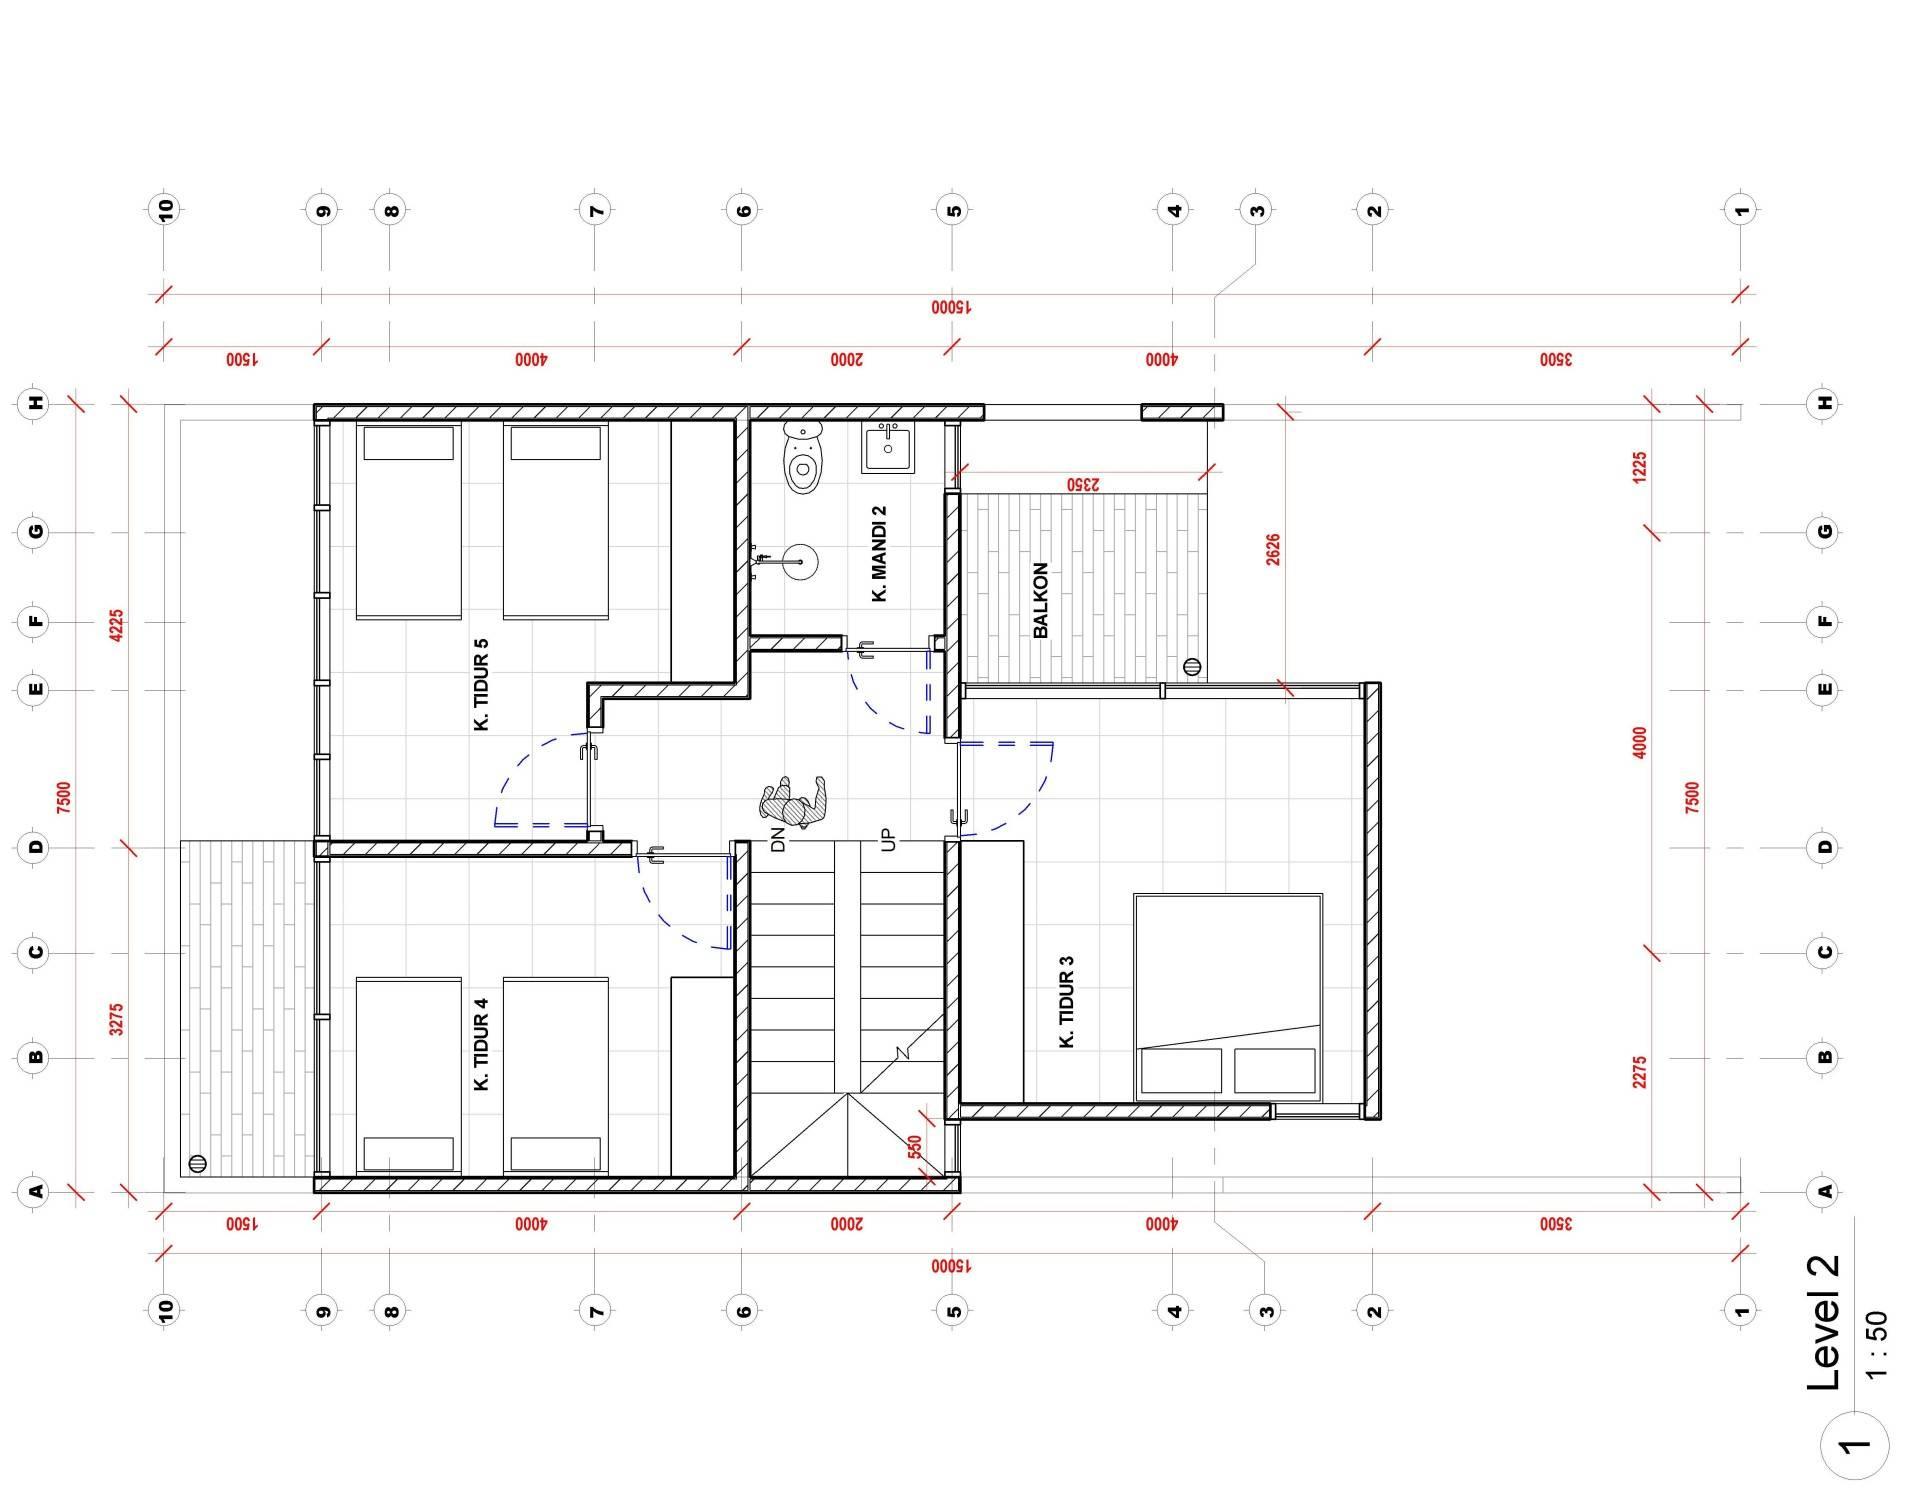 Nico Gowindra Ss-House Bsd - Tangerang Bsd - Tangerang Denah Kontemporer,modern  3791